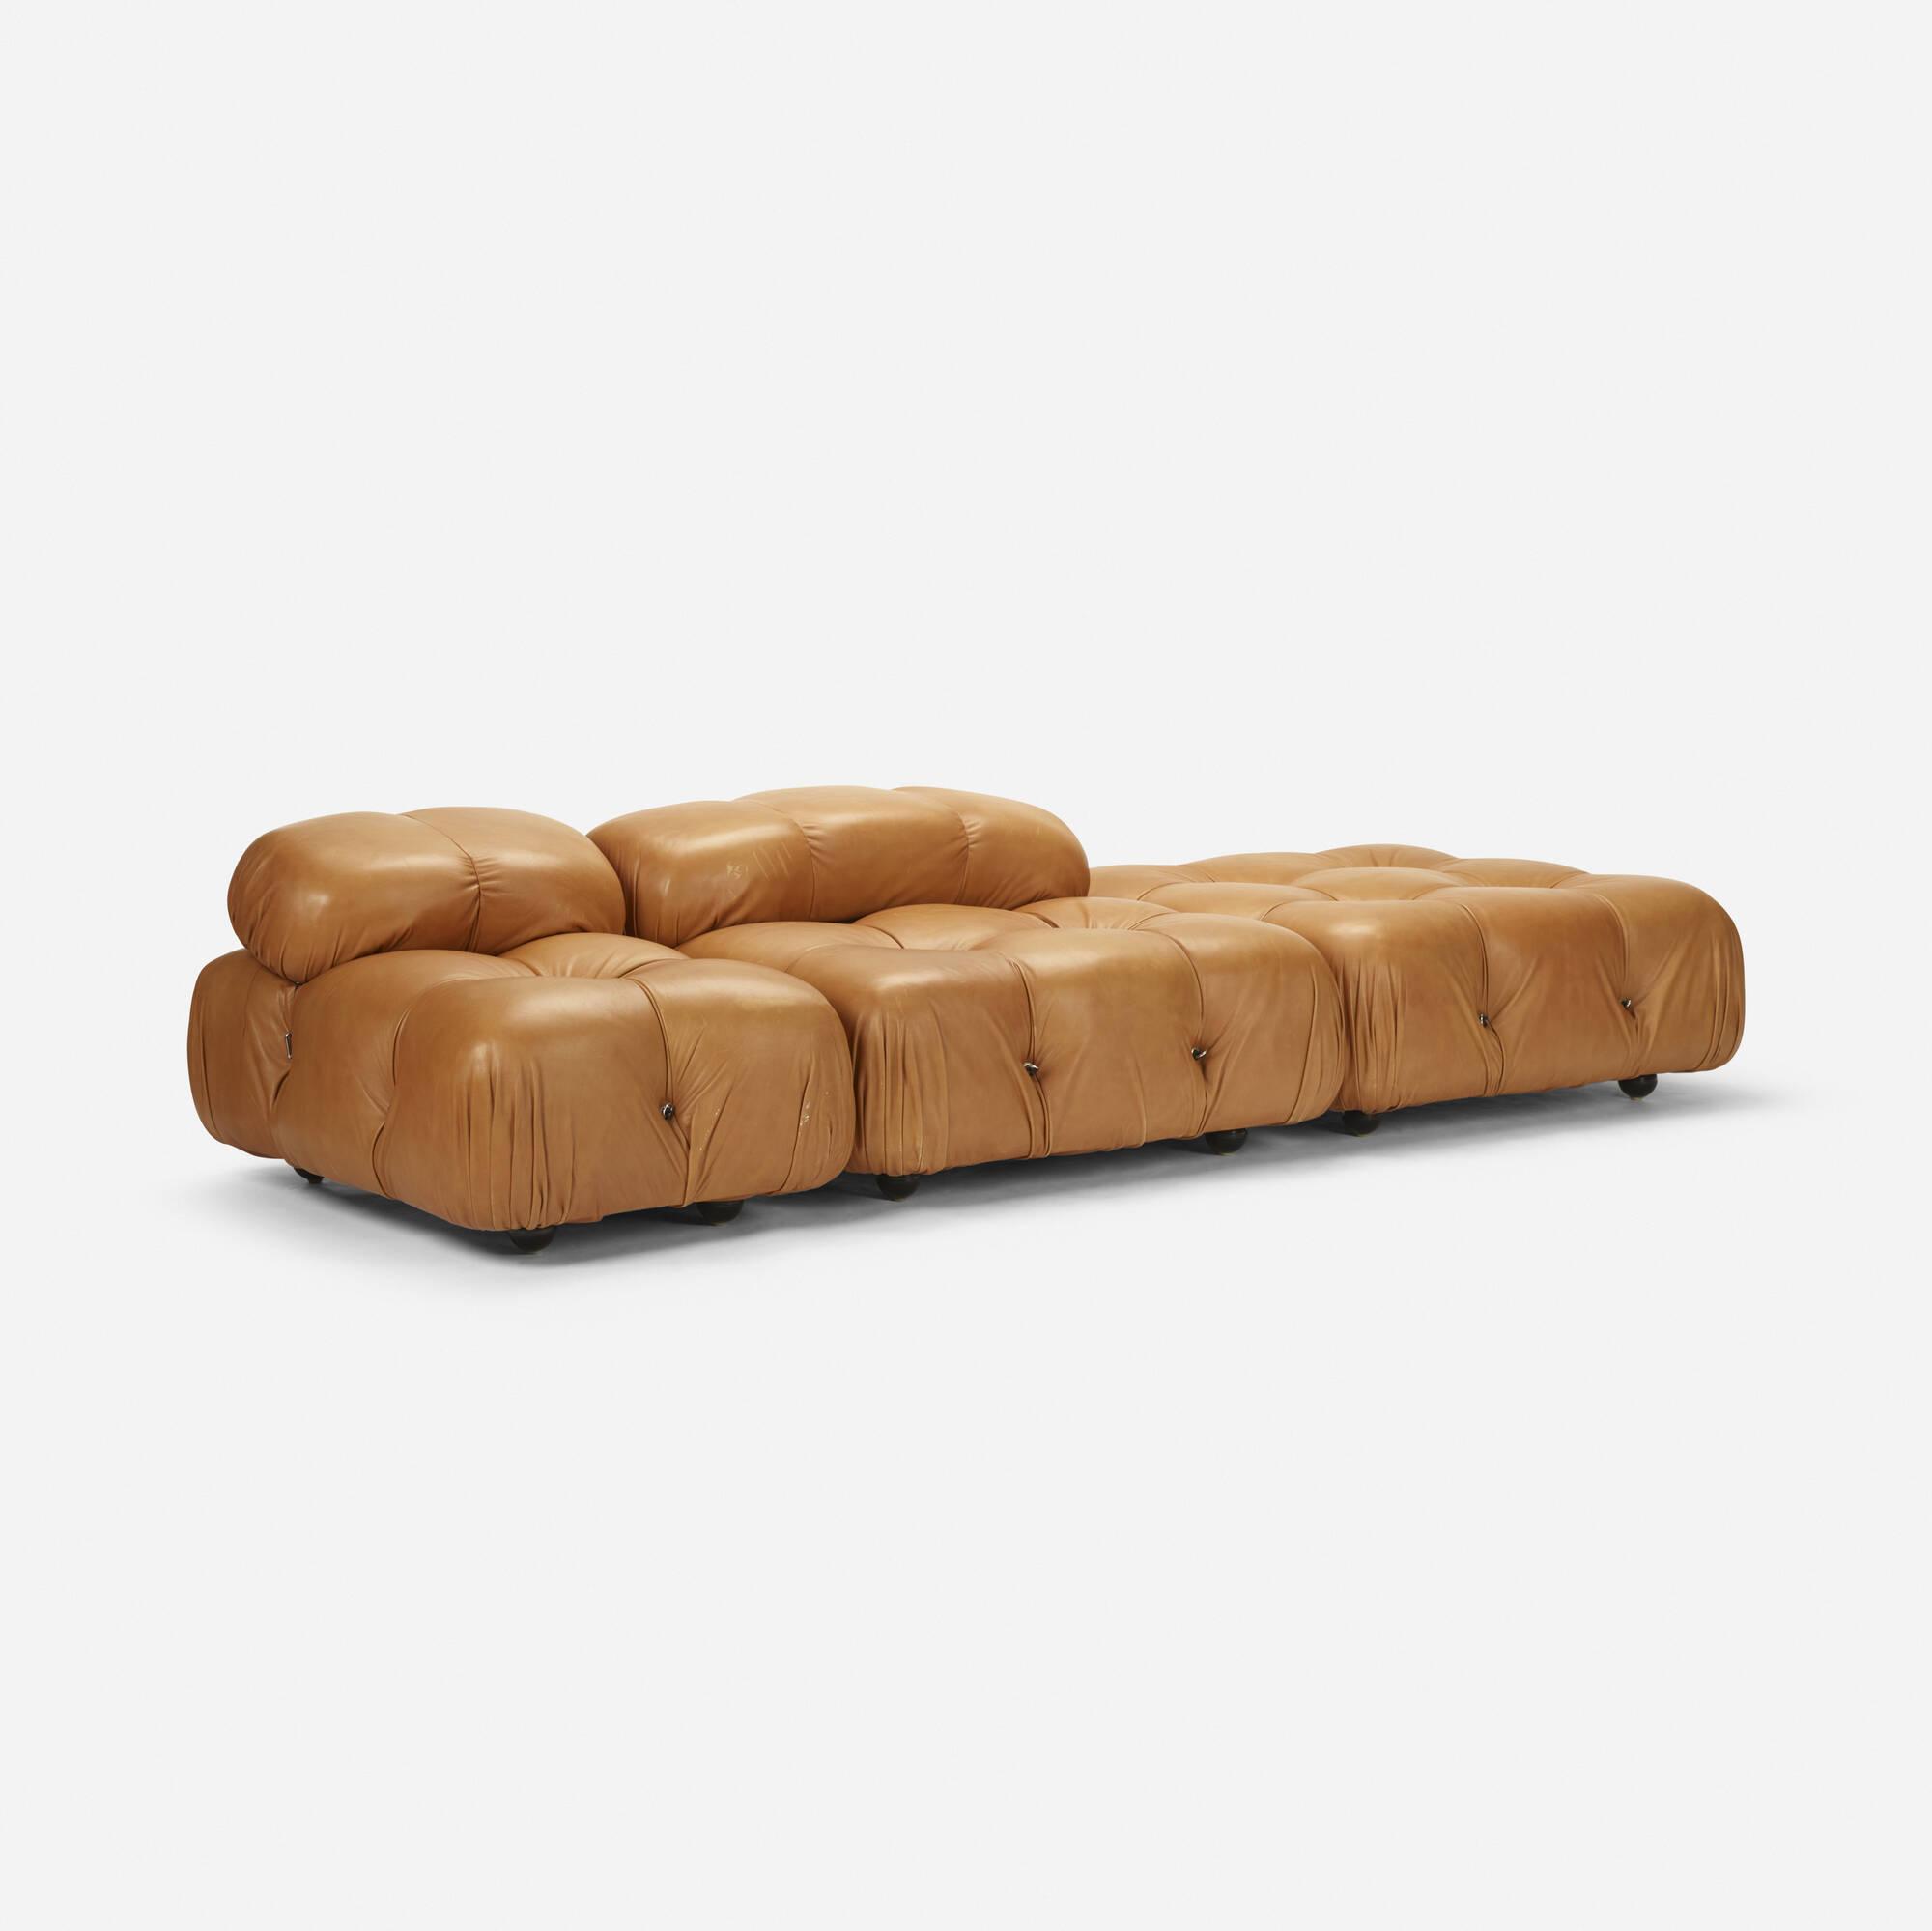 mario bellini sofa mario bellini oracle fox thesofa. Black Bedroom Furniture Sets. Home Design Ideas